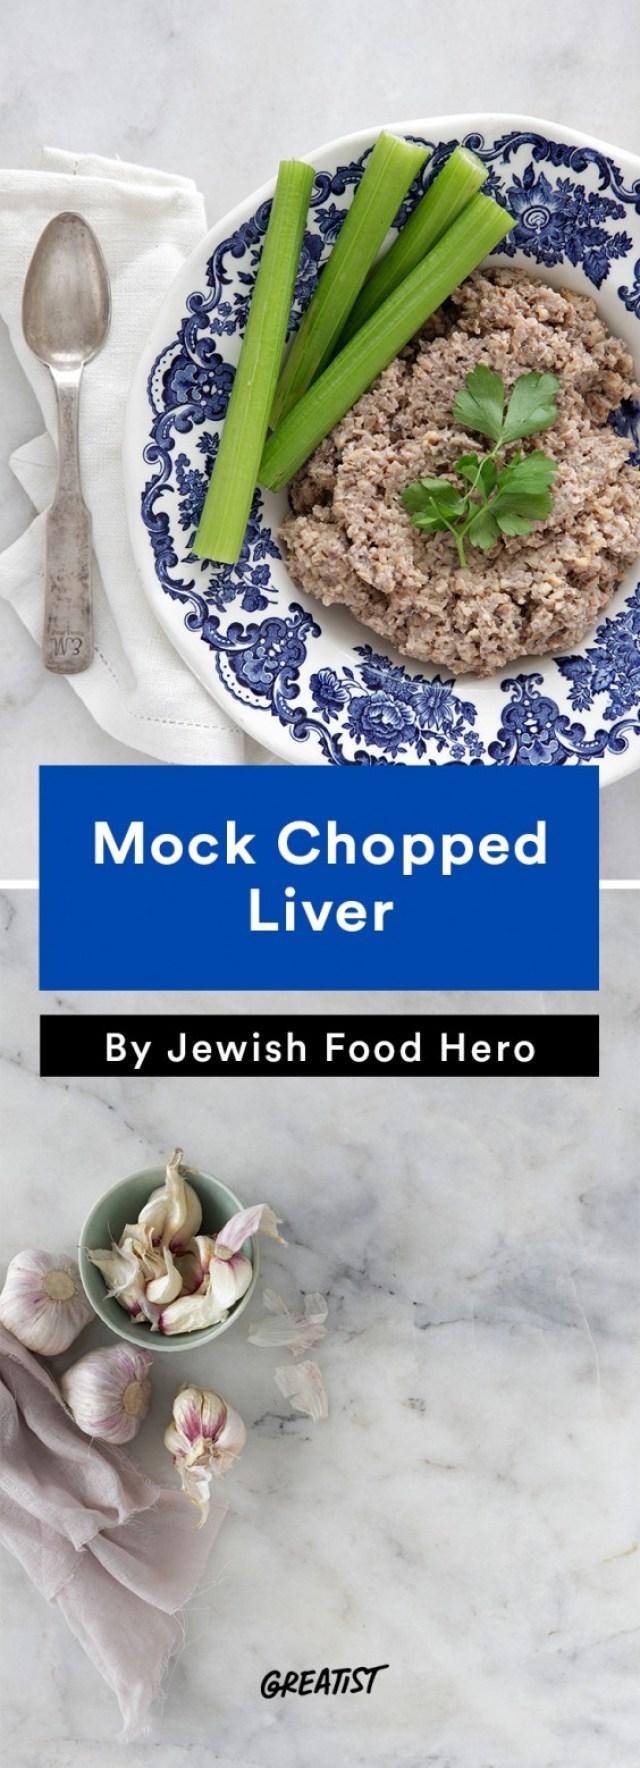 jewish food hero: Mock Chopped Liver